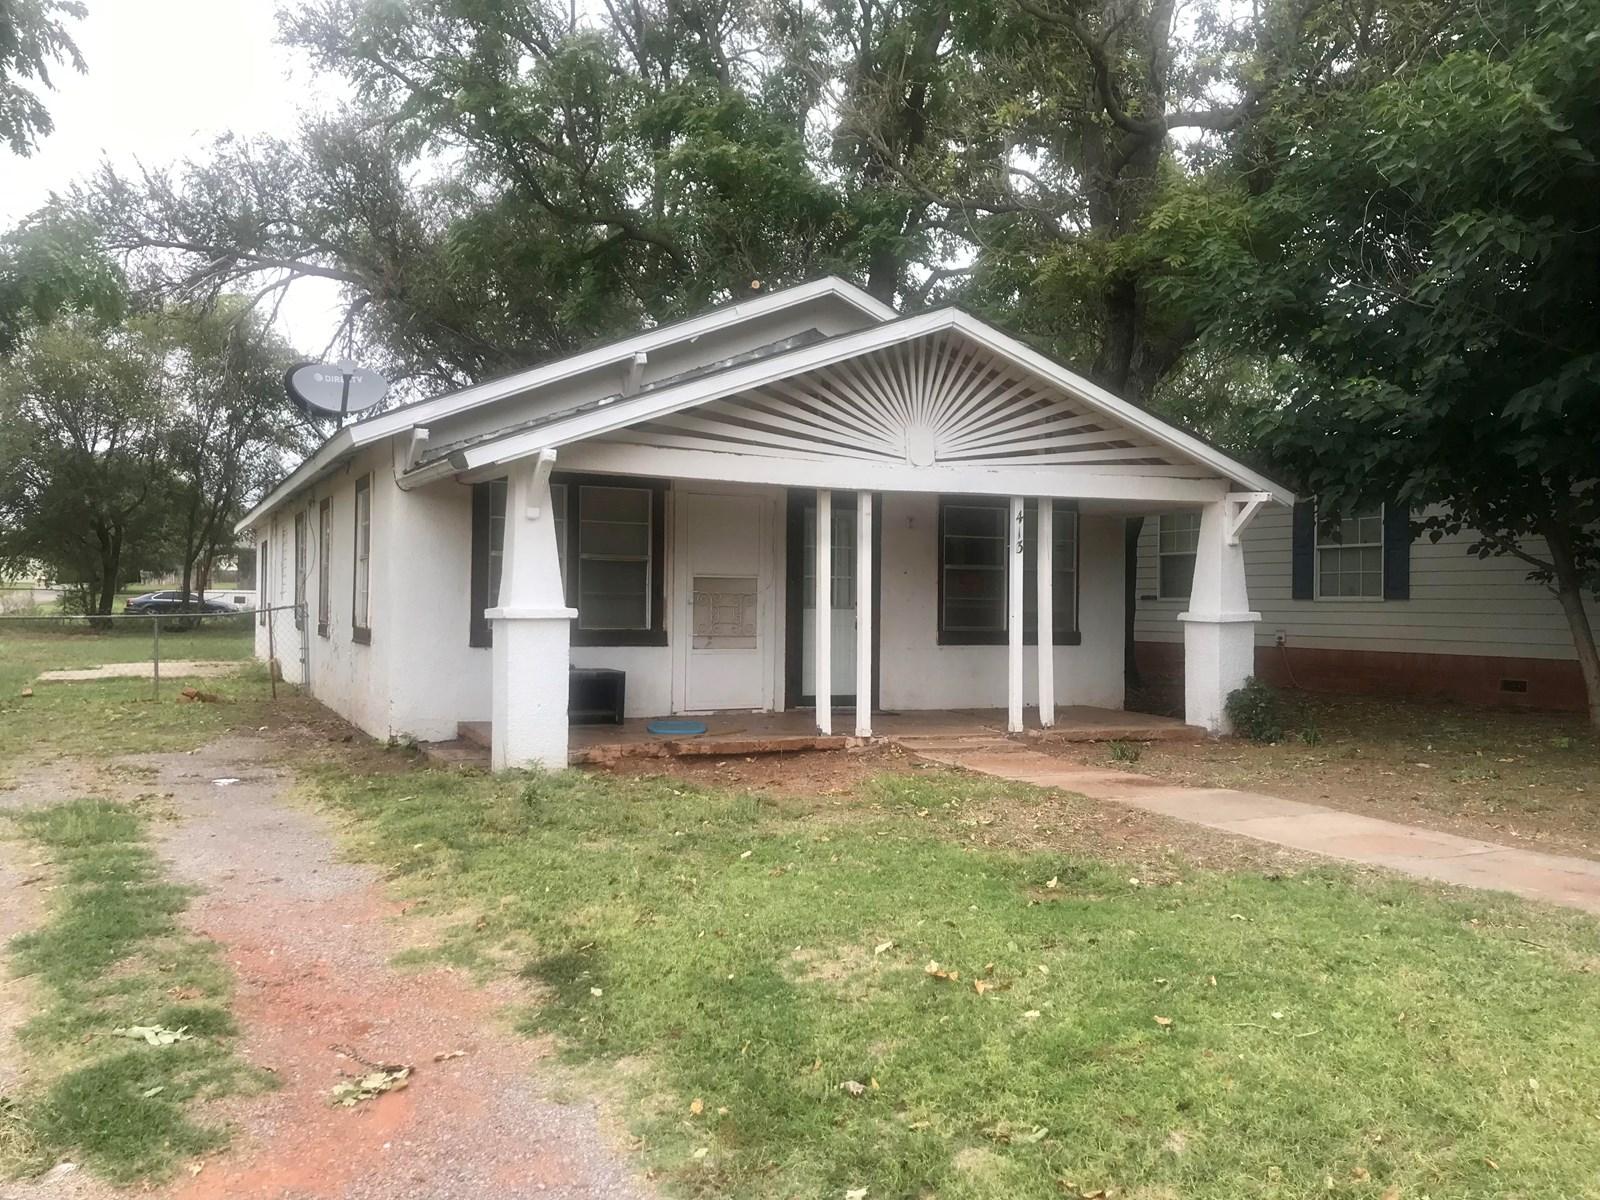 INVESTOR RENTAL HOME FOR SALE 3 BEDROOMS SAYRE OK RT 66